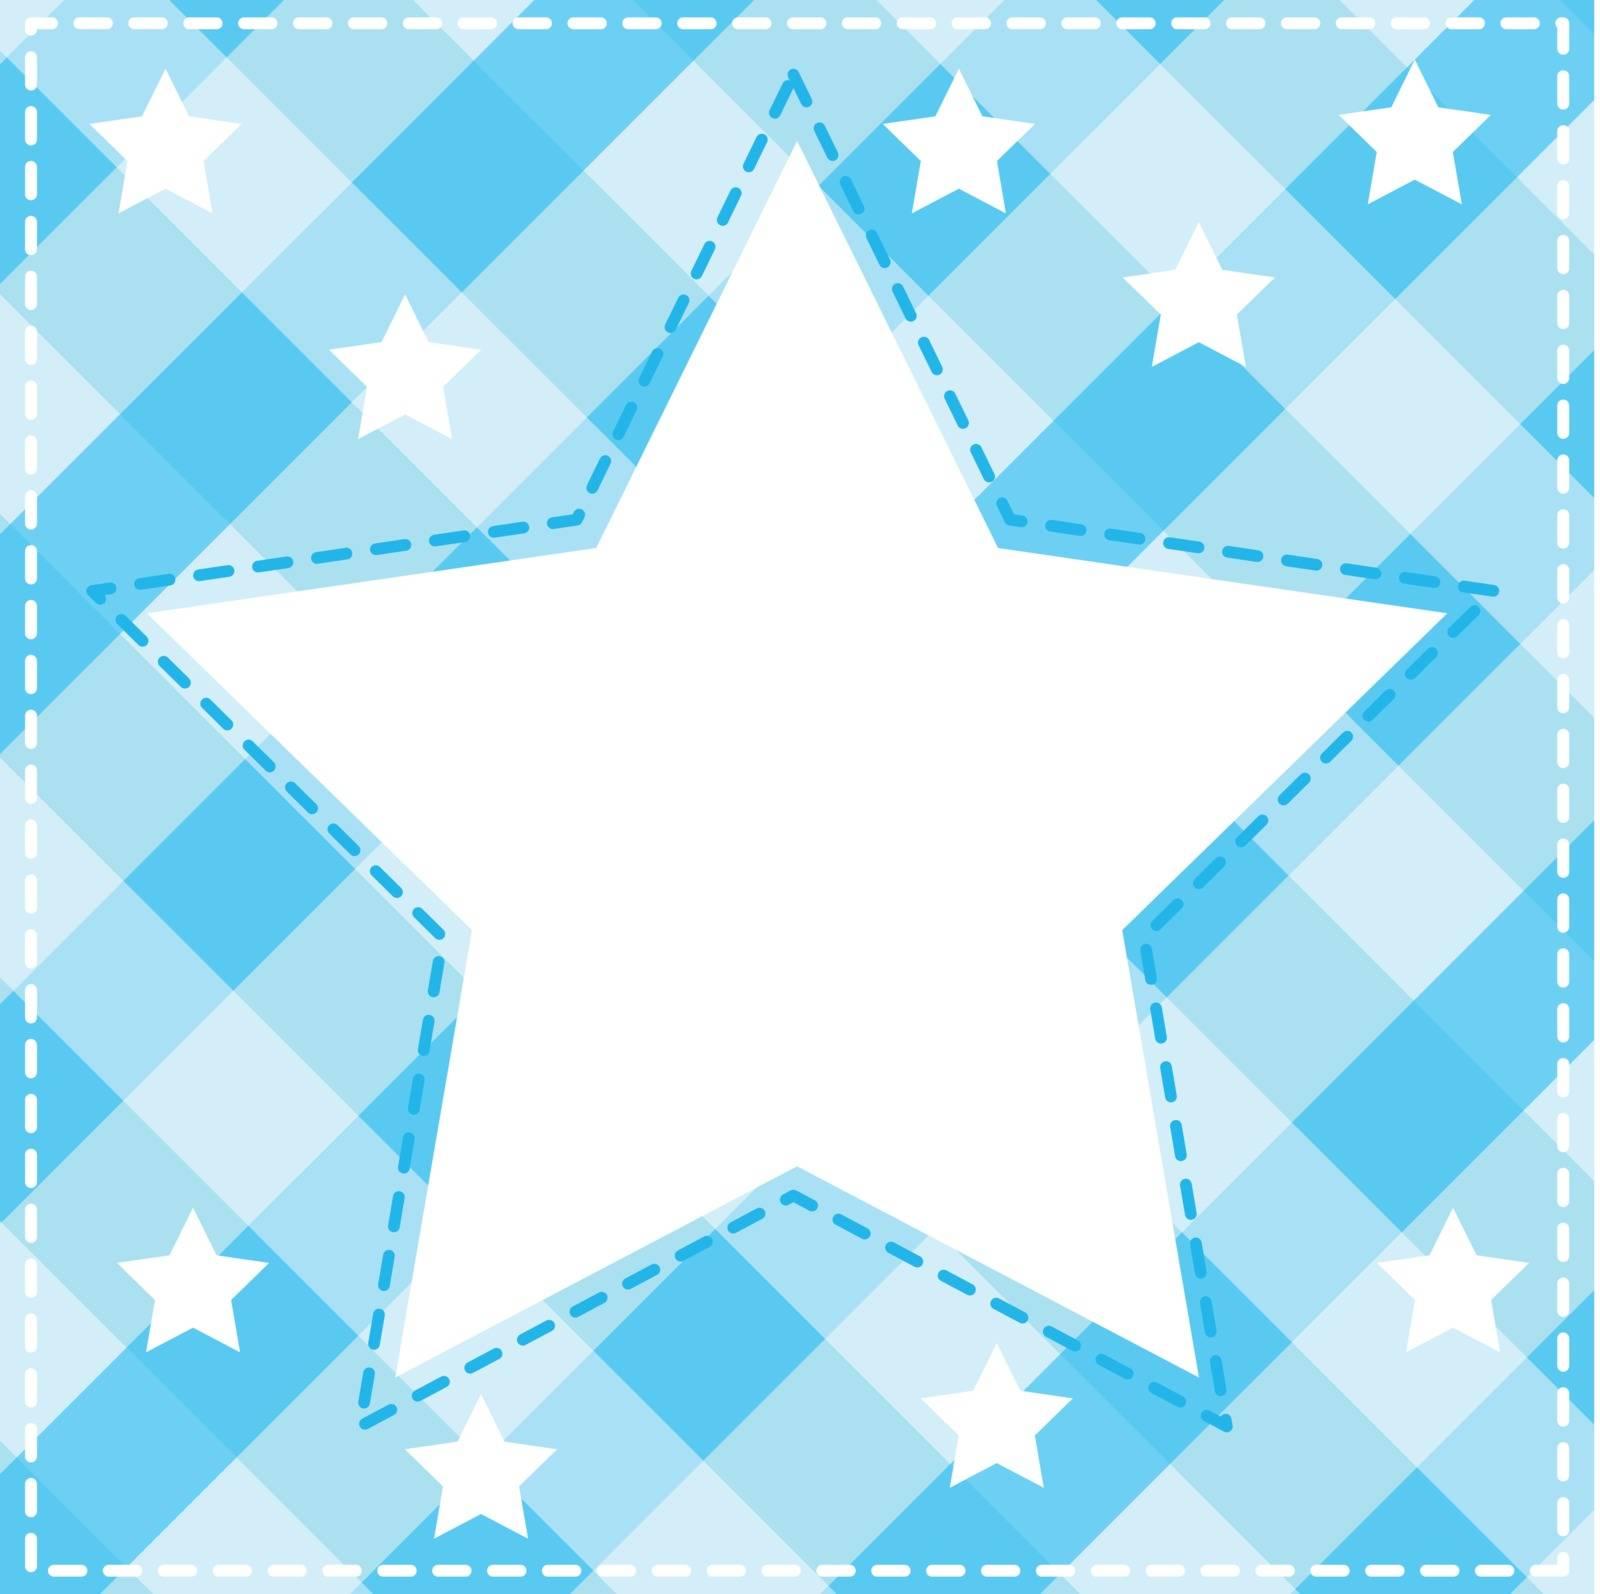 illustration of a blue wallpaper